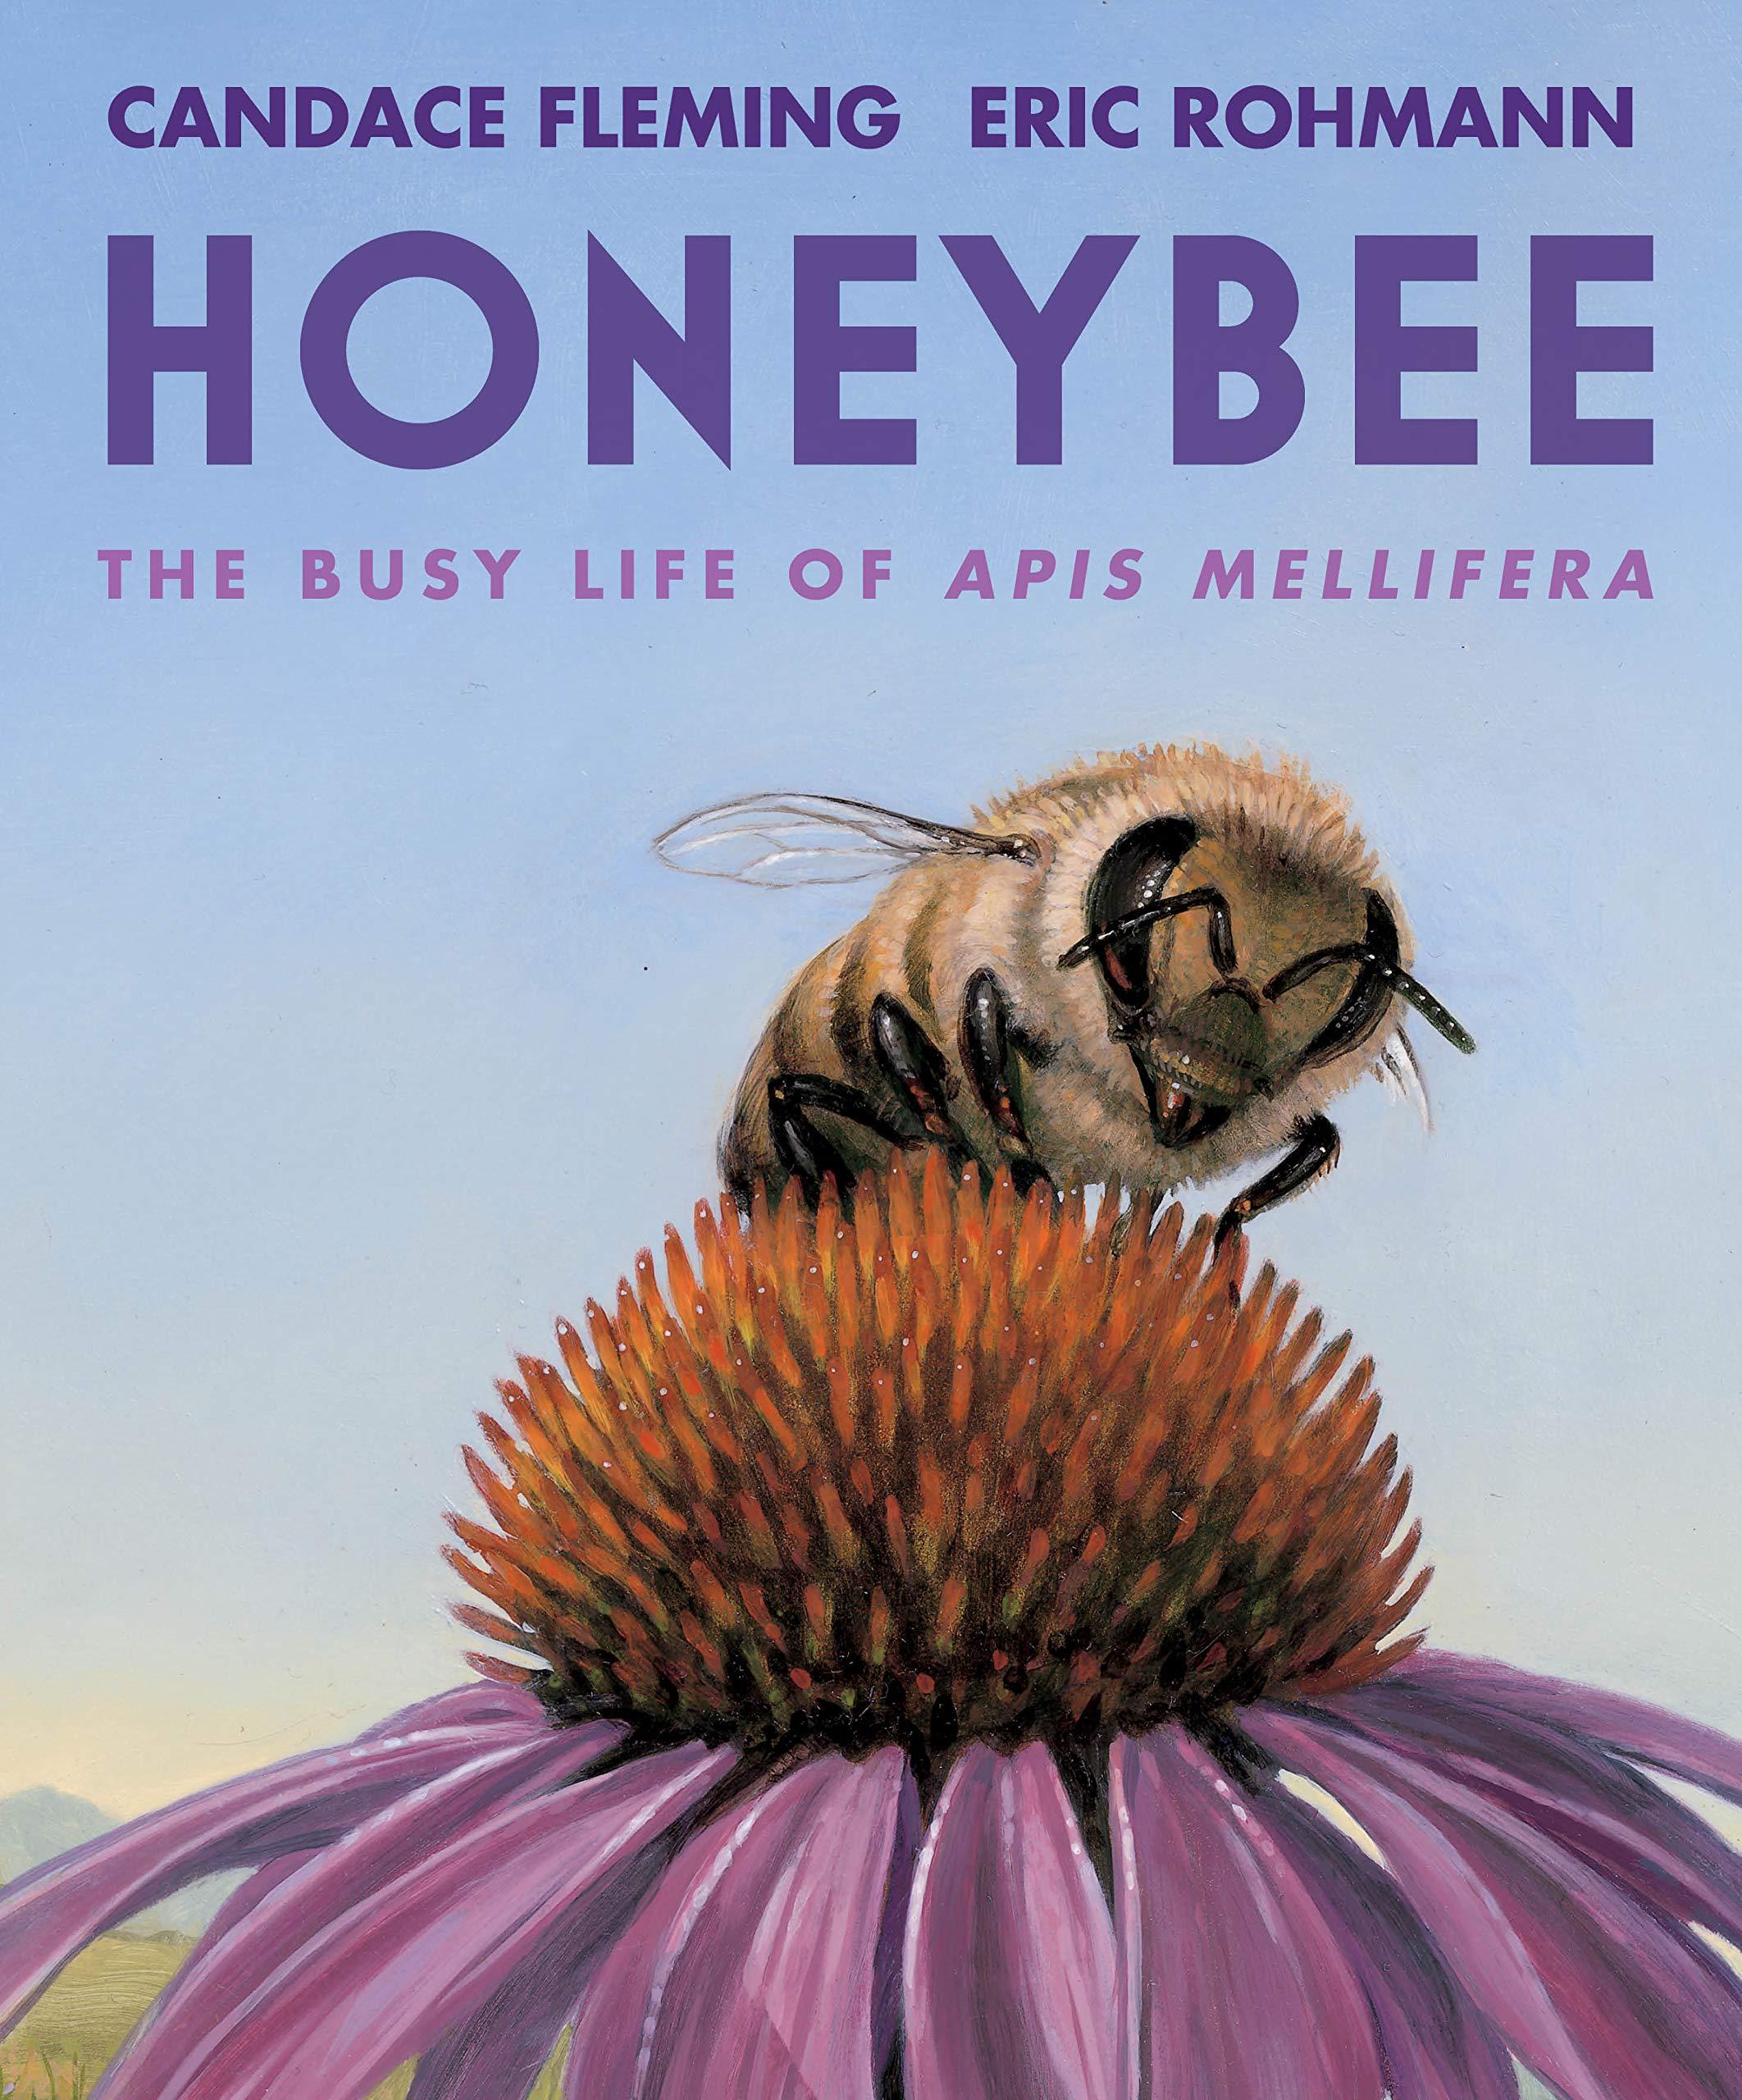 Honeybee: The Busy Life of Apis Mellifera: Fleming, Candace, Rohmann, Eric:  9780823442850: Amazon.com: Books